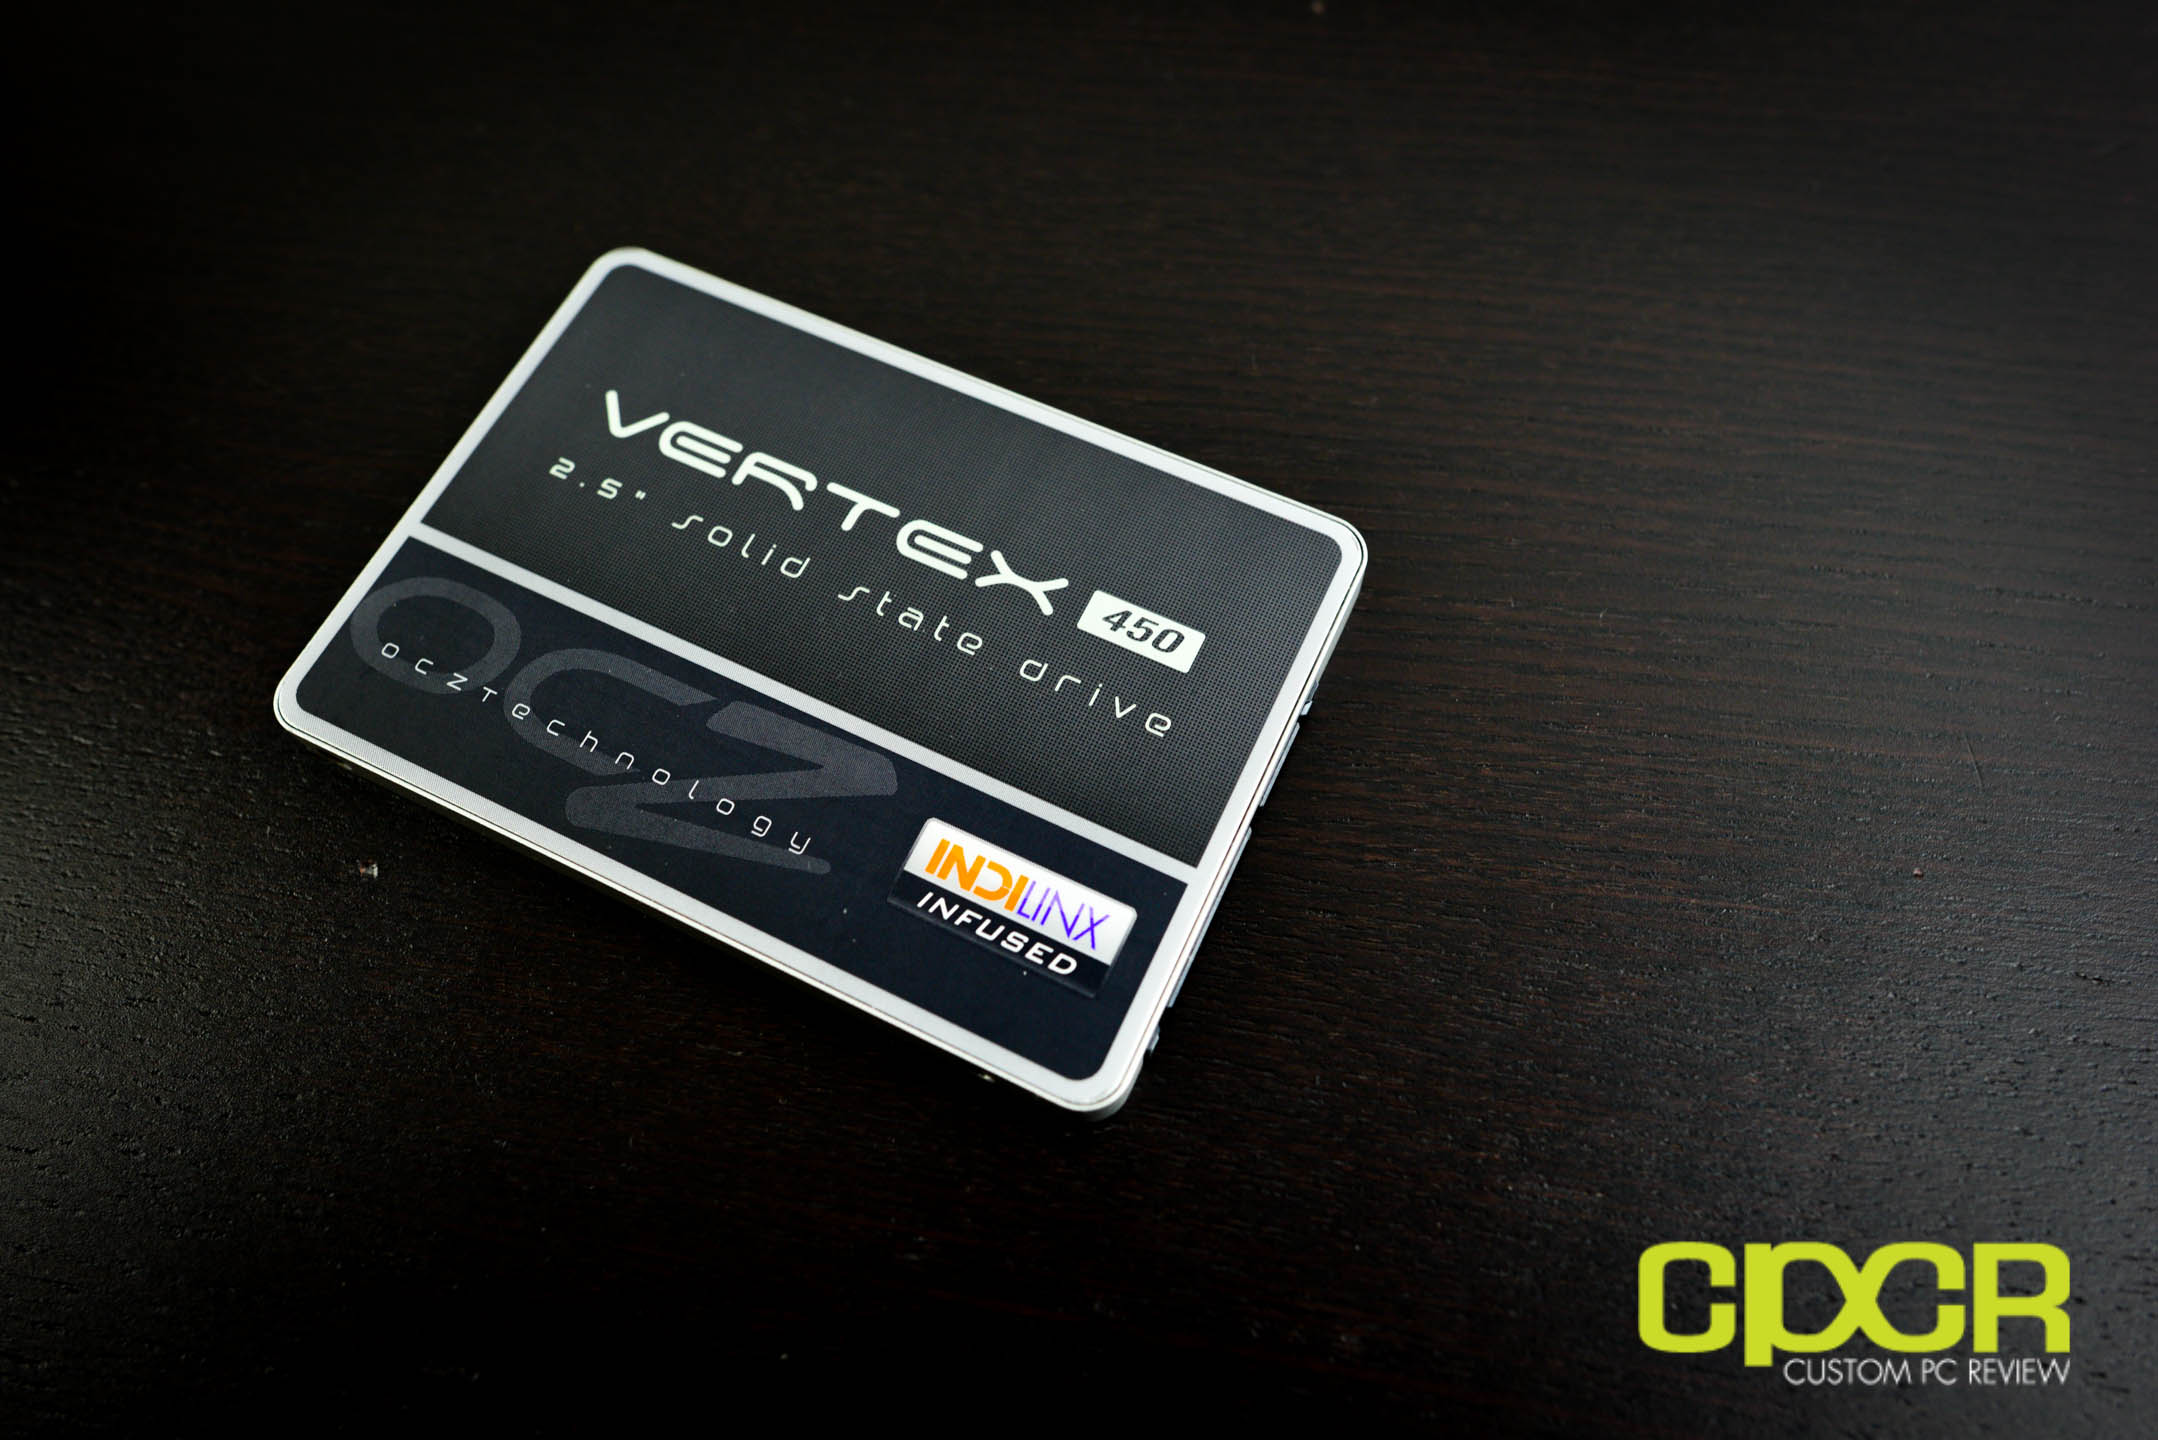 ocz-vertex-450-256gb-ssd-custom-pc-review-8